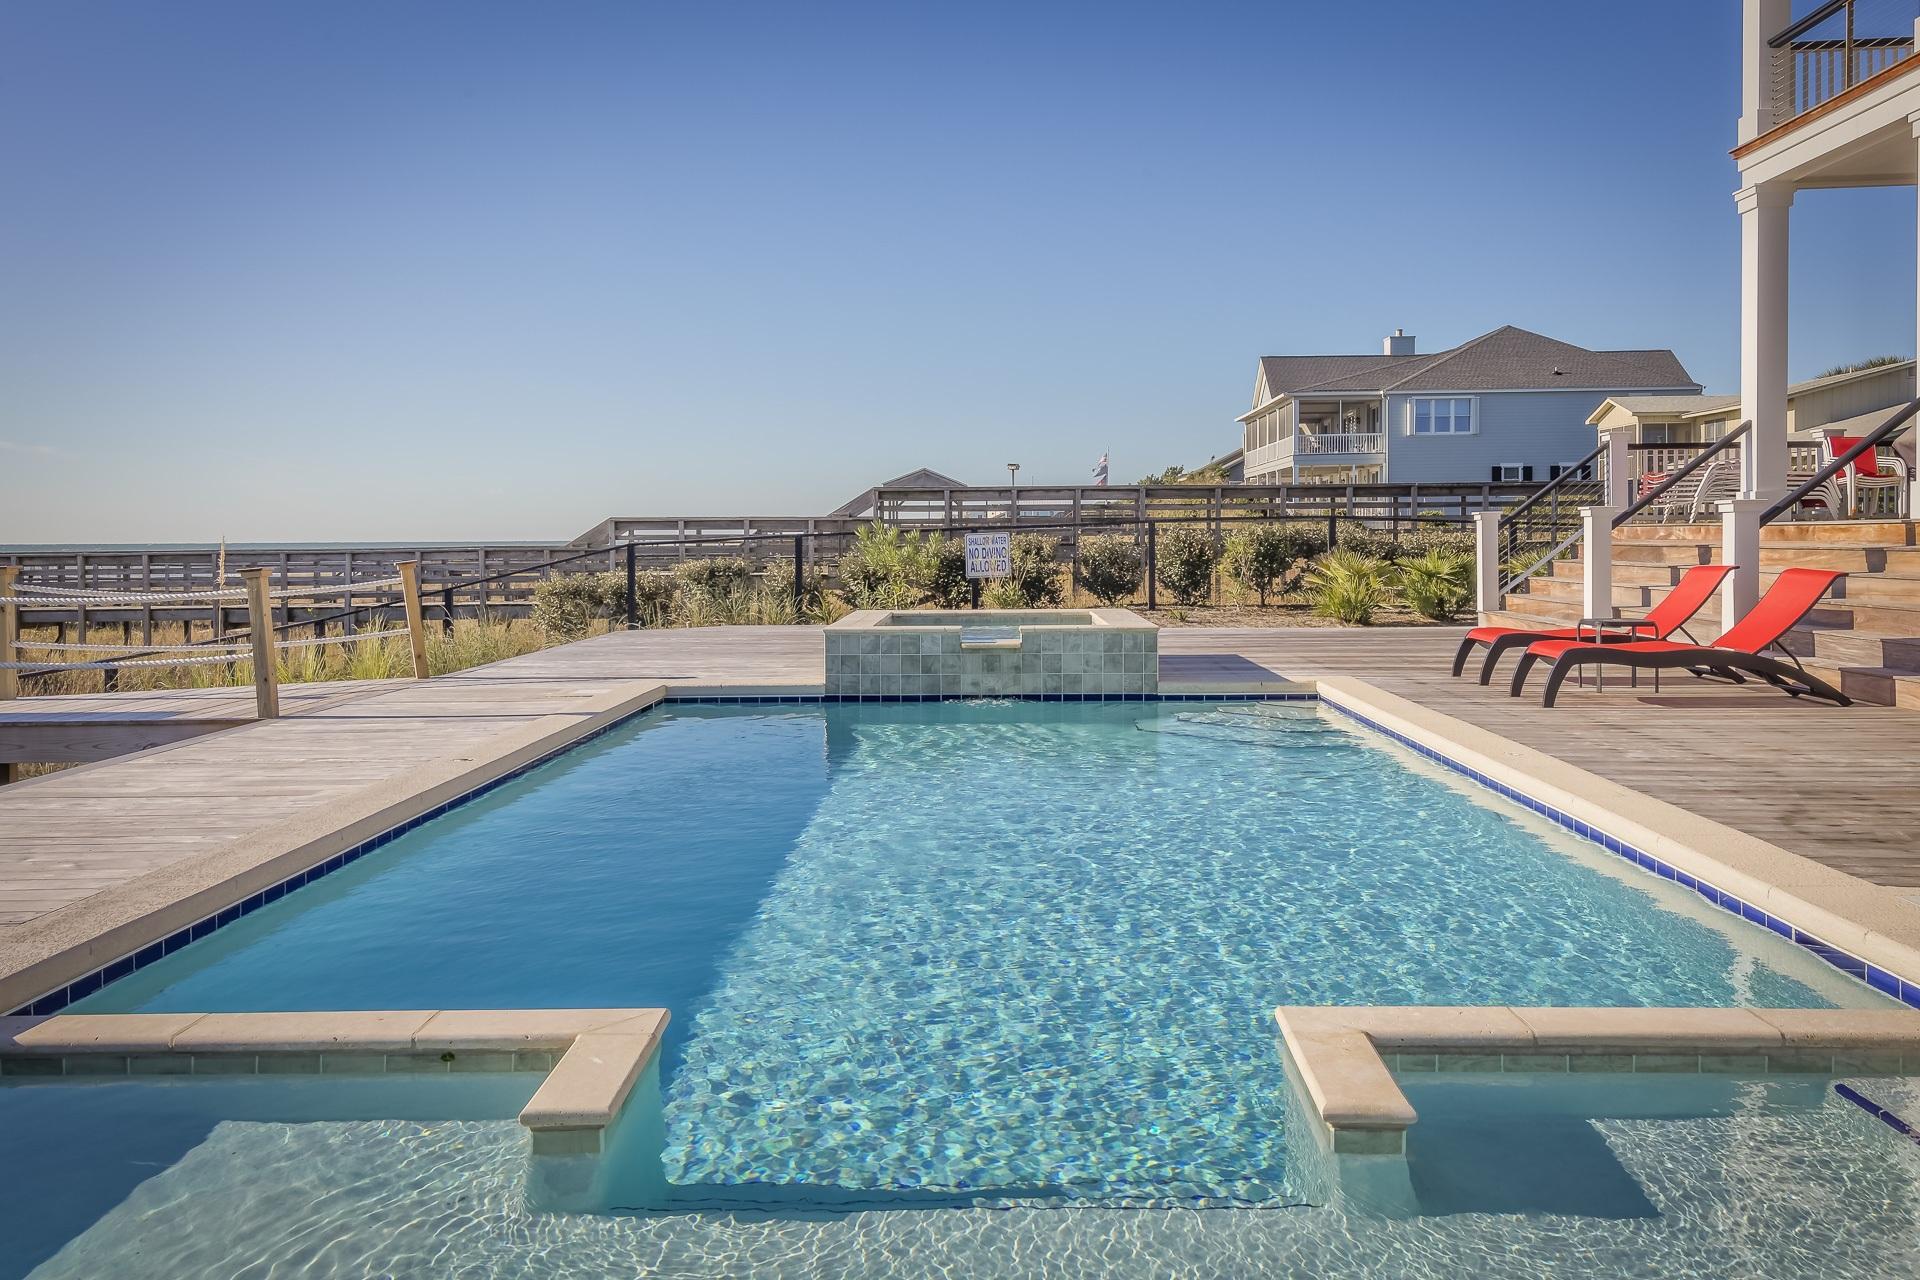 Swimming Pool Under Blue Sky